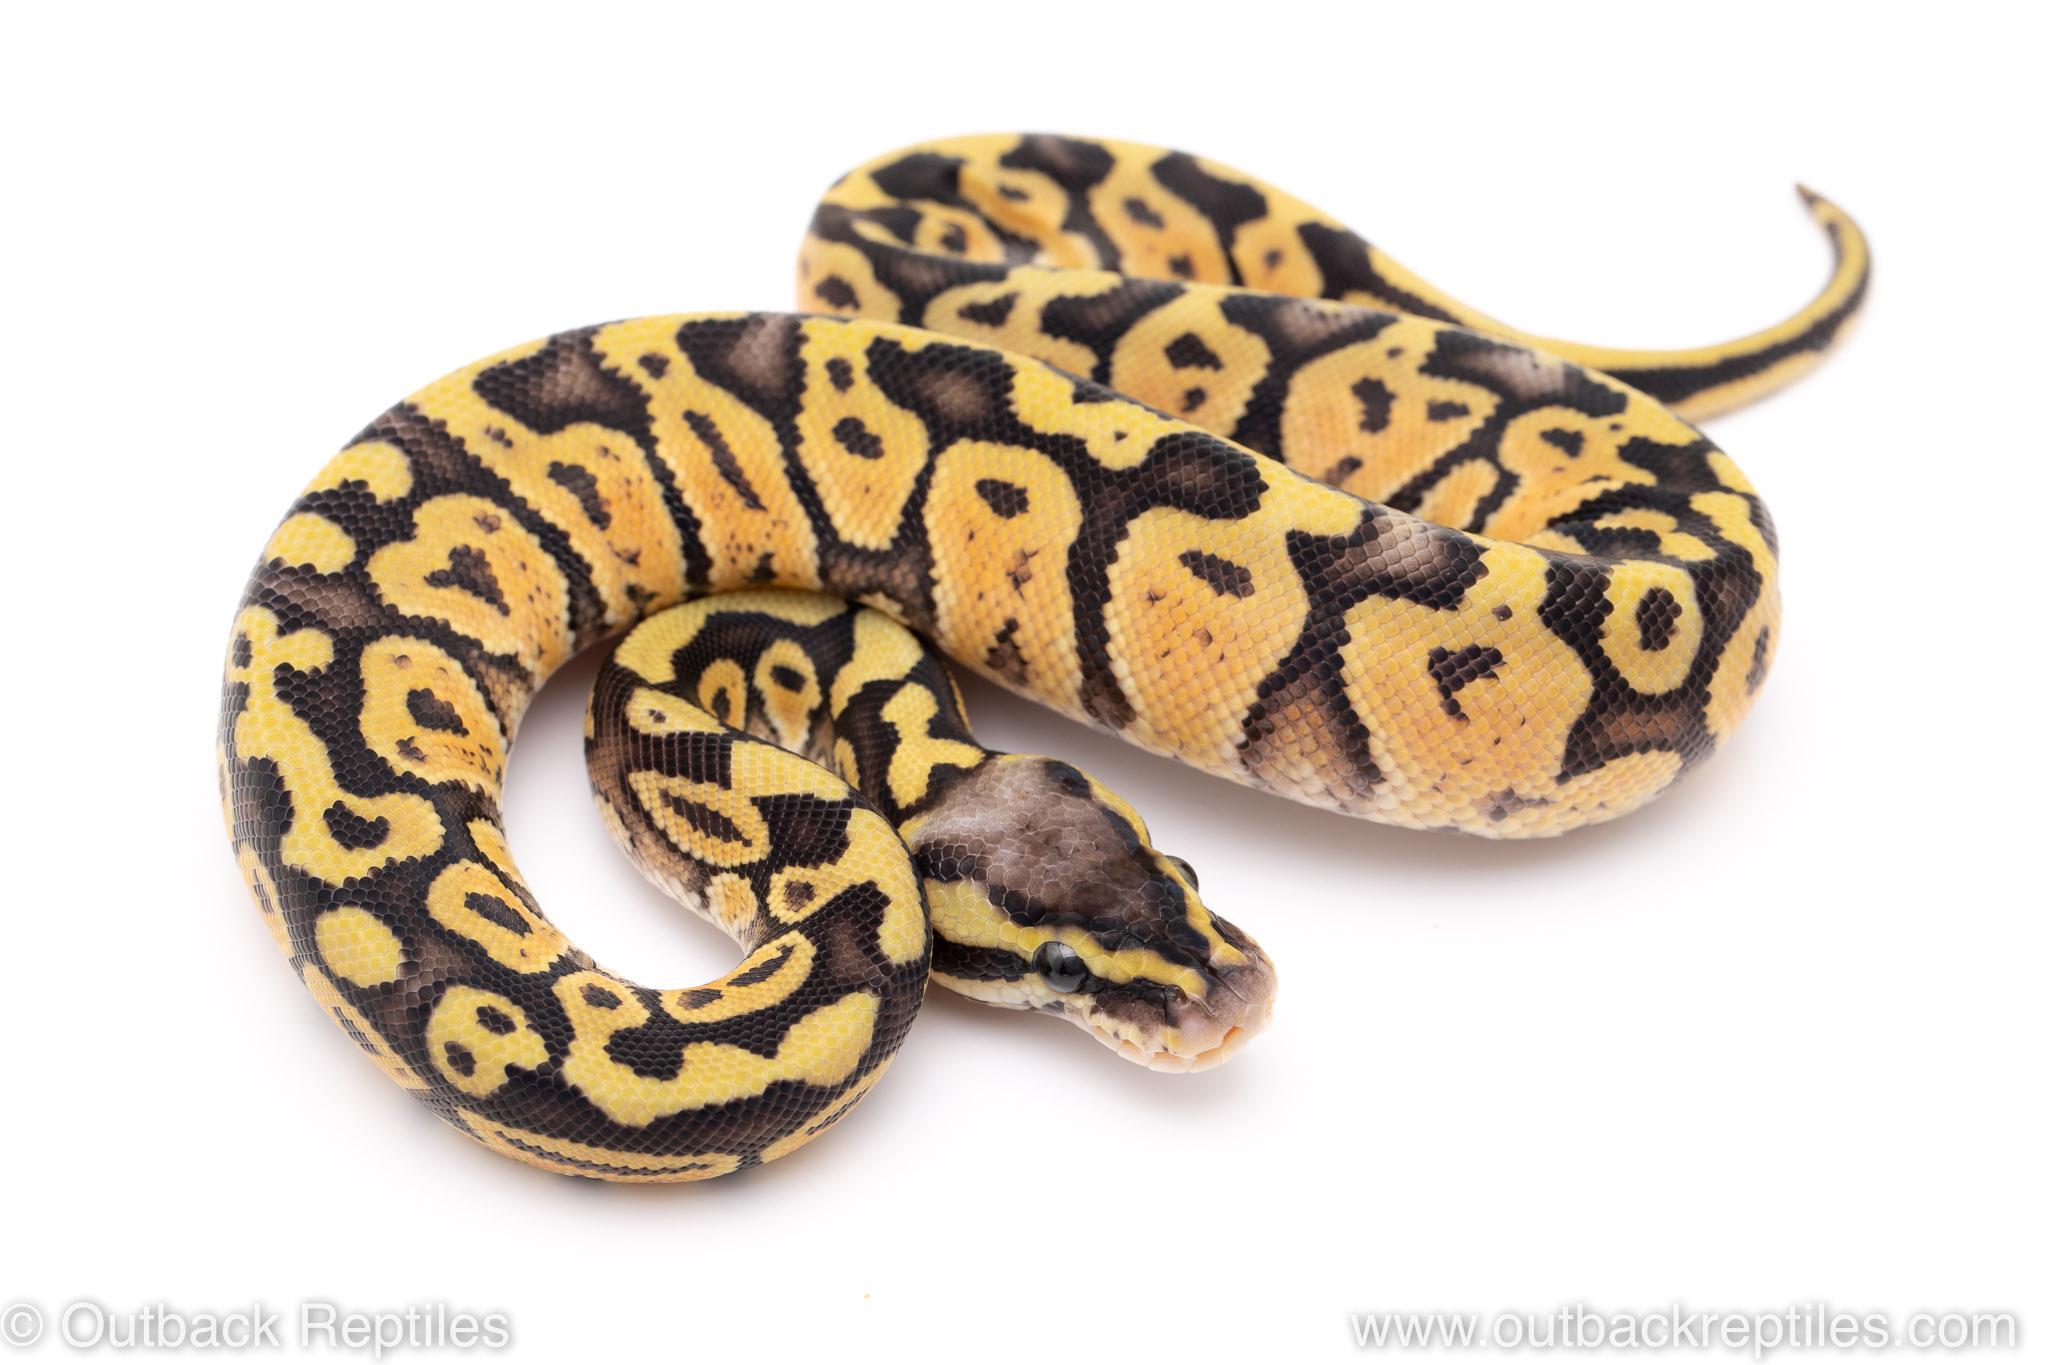 Super pastel lace ball python for sale